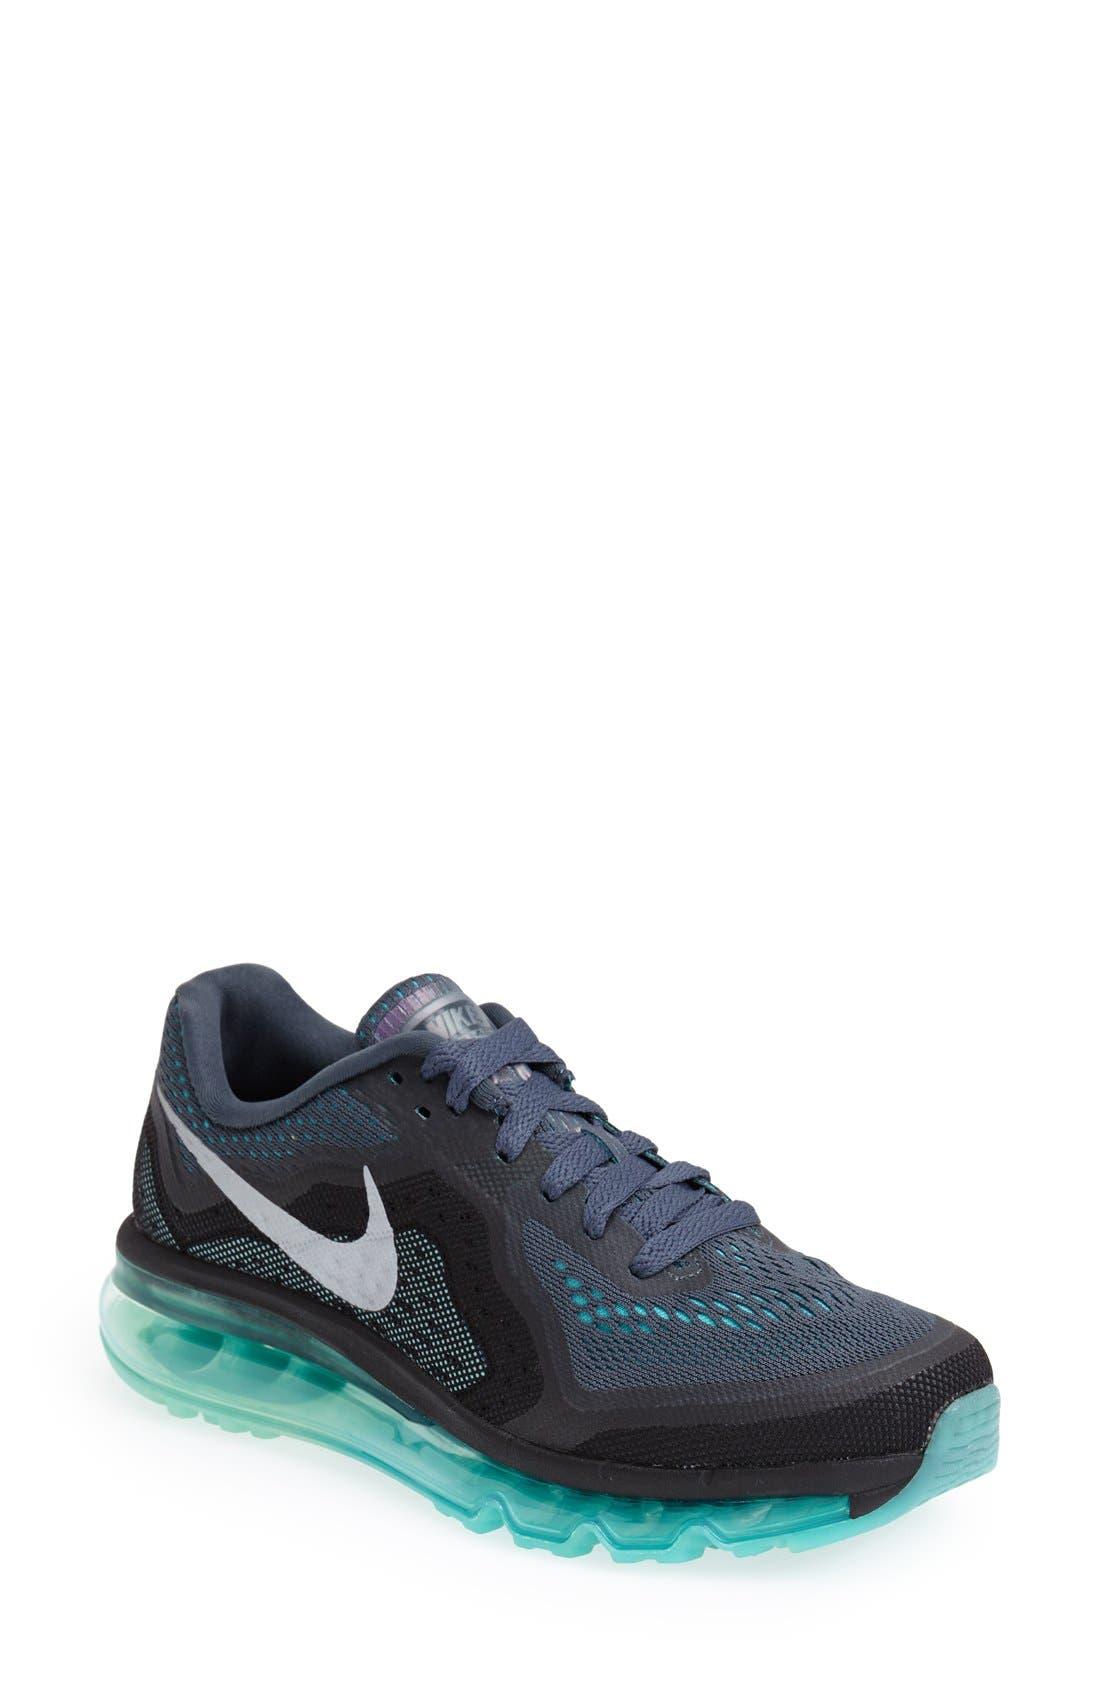 Alternate Image 1 Selected - Nike 'Air Max 2014' Running Shoe (Women)